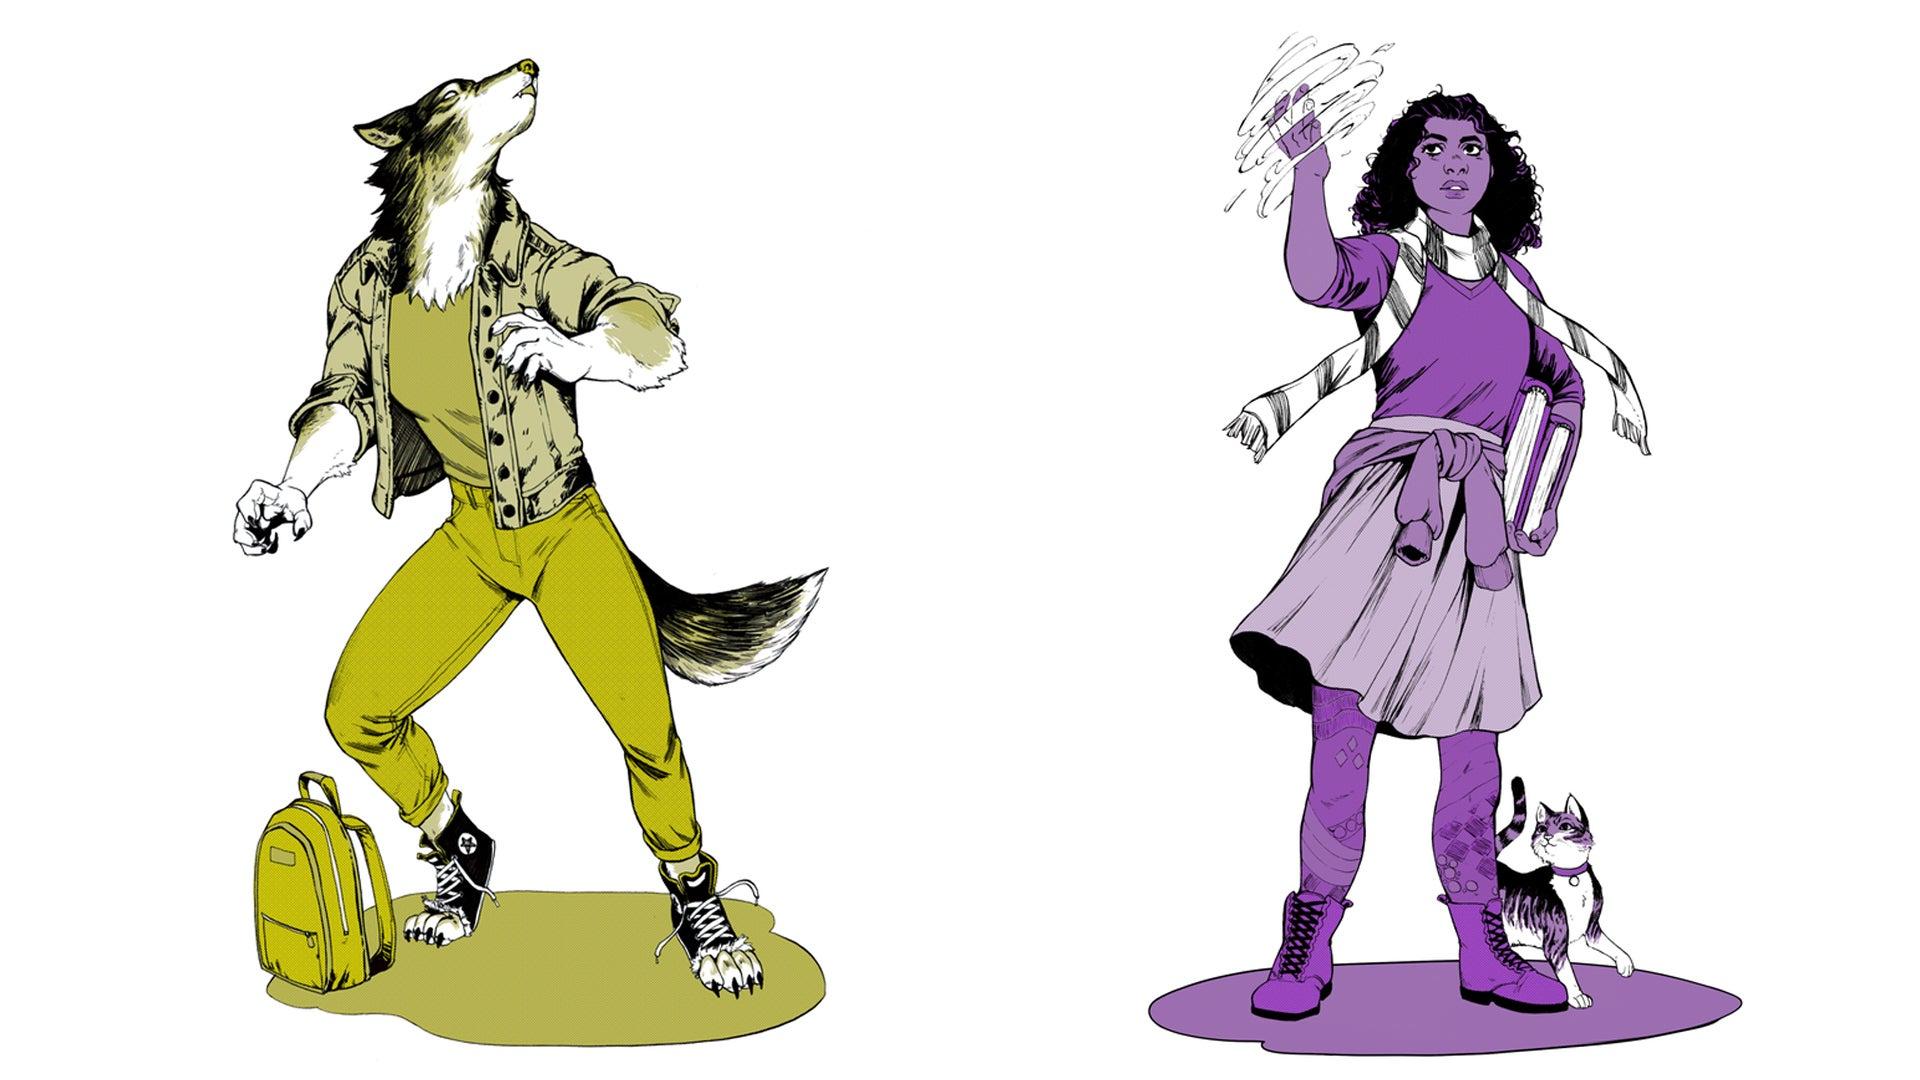 Dark Places and Demogorgons RPG artwork characters